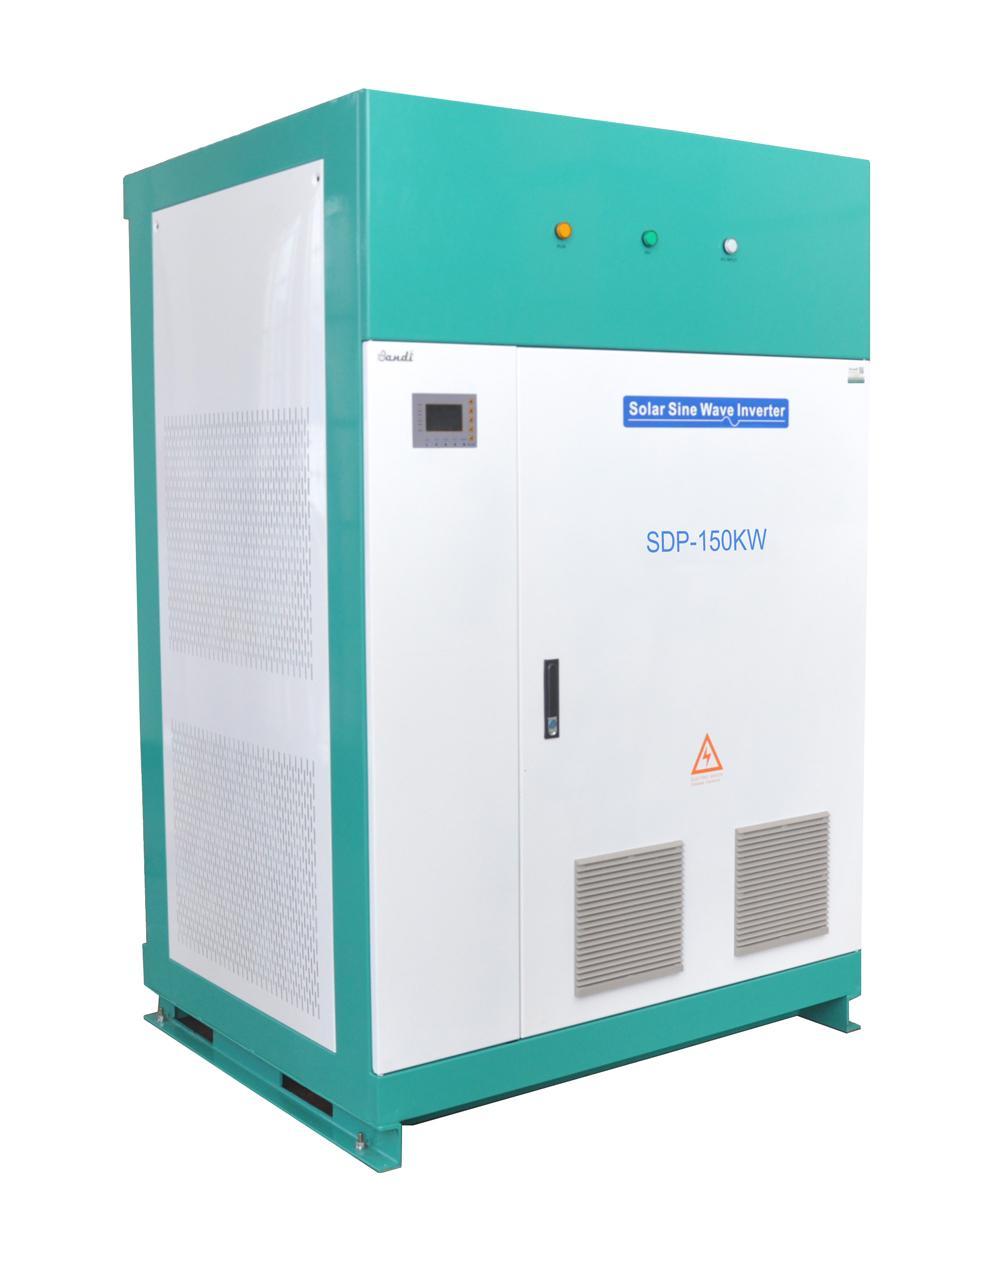 off grid inverter 380V solar power inverter SDP-150KW three phase inverter